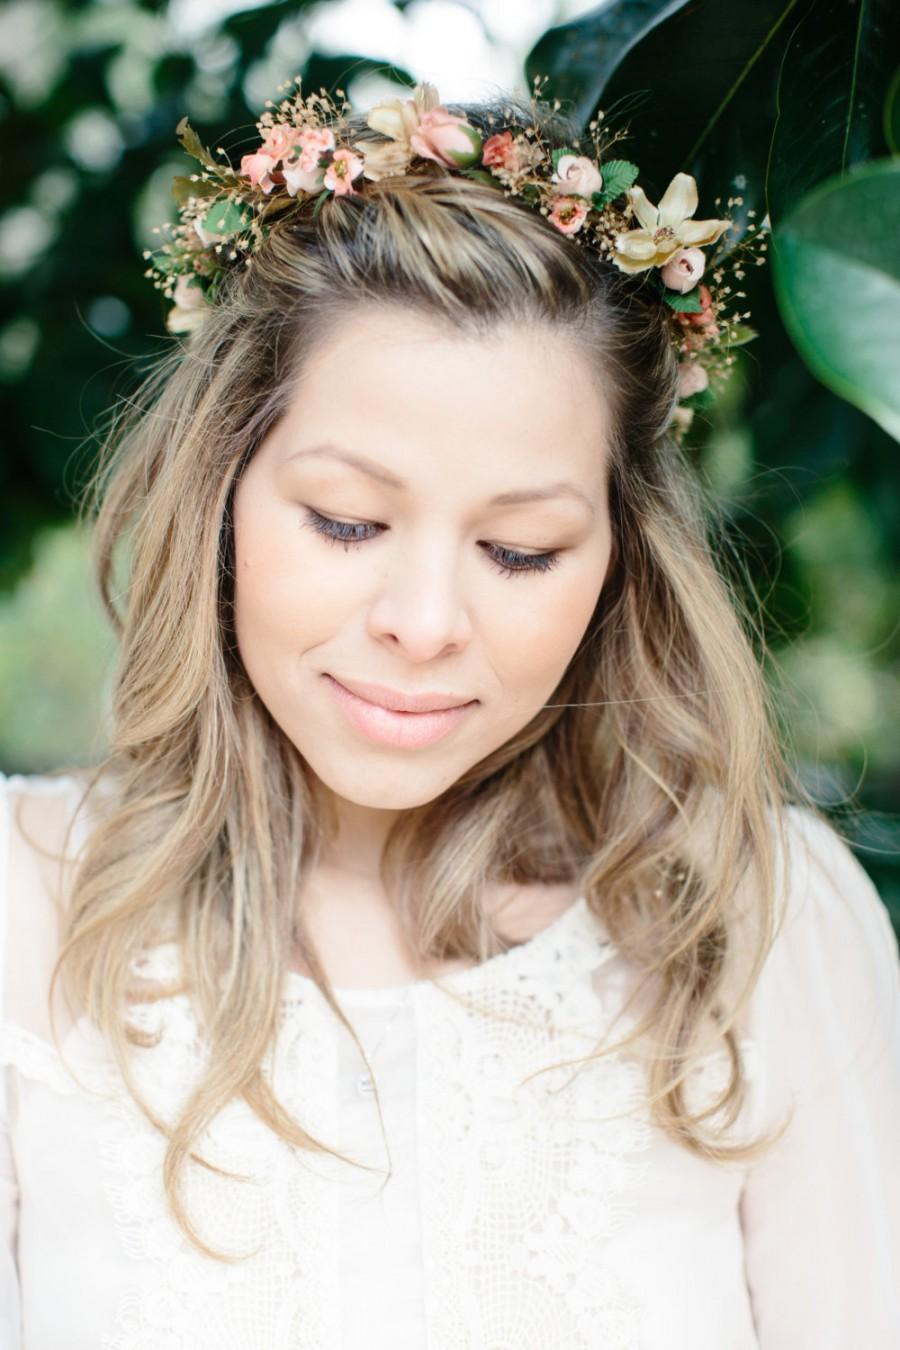 زفاف - Wedding Flower crown peach Woodland Bridal party dried Floral fall hair wreath Accessories girl halo Fairy circlet champagne babys breath